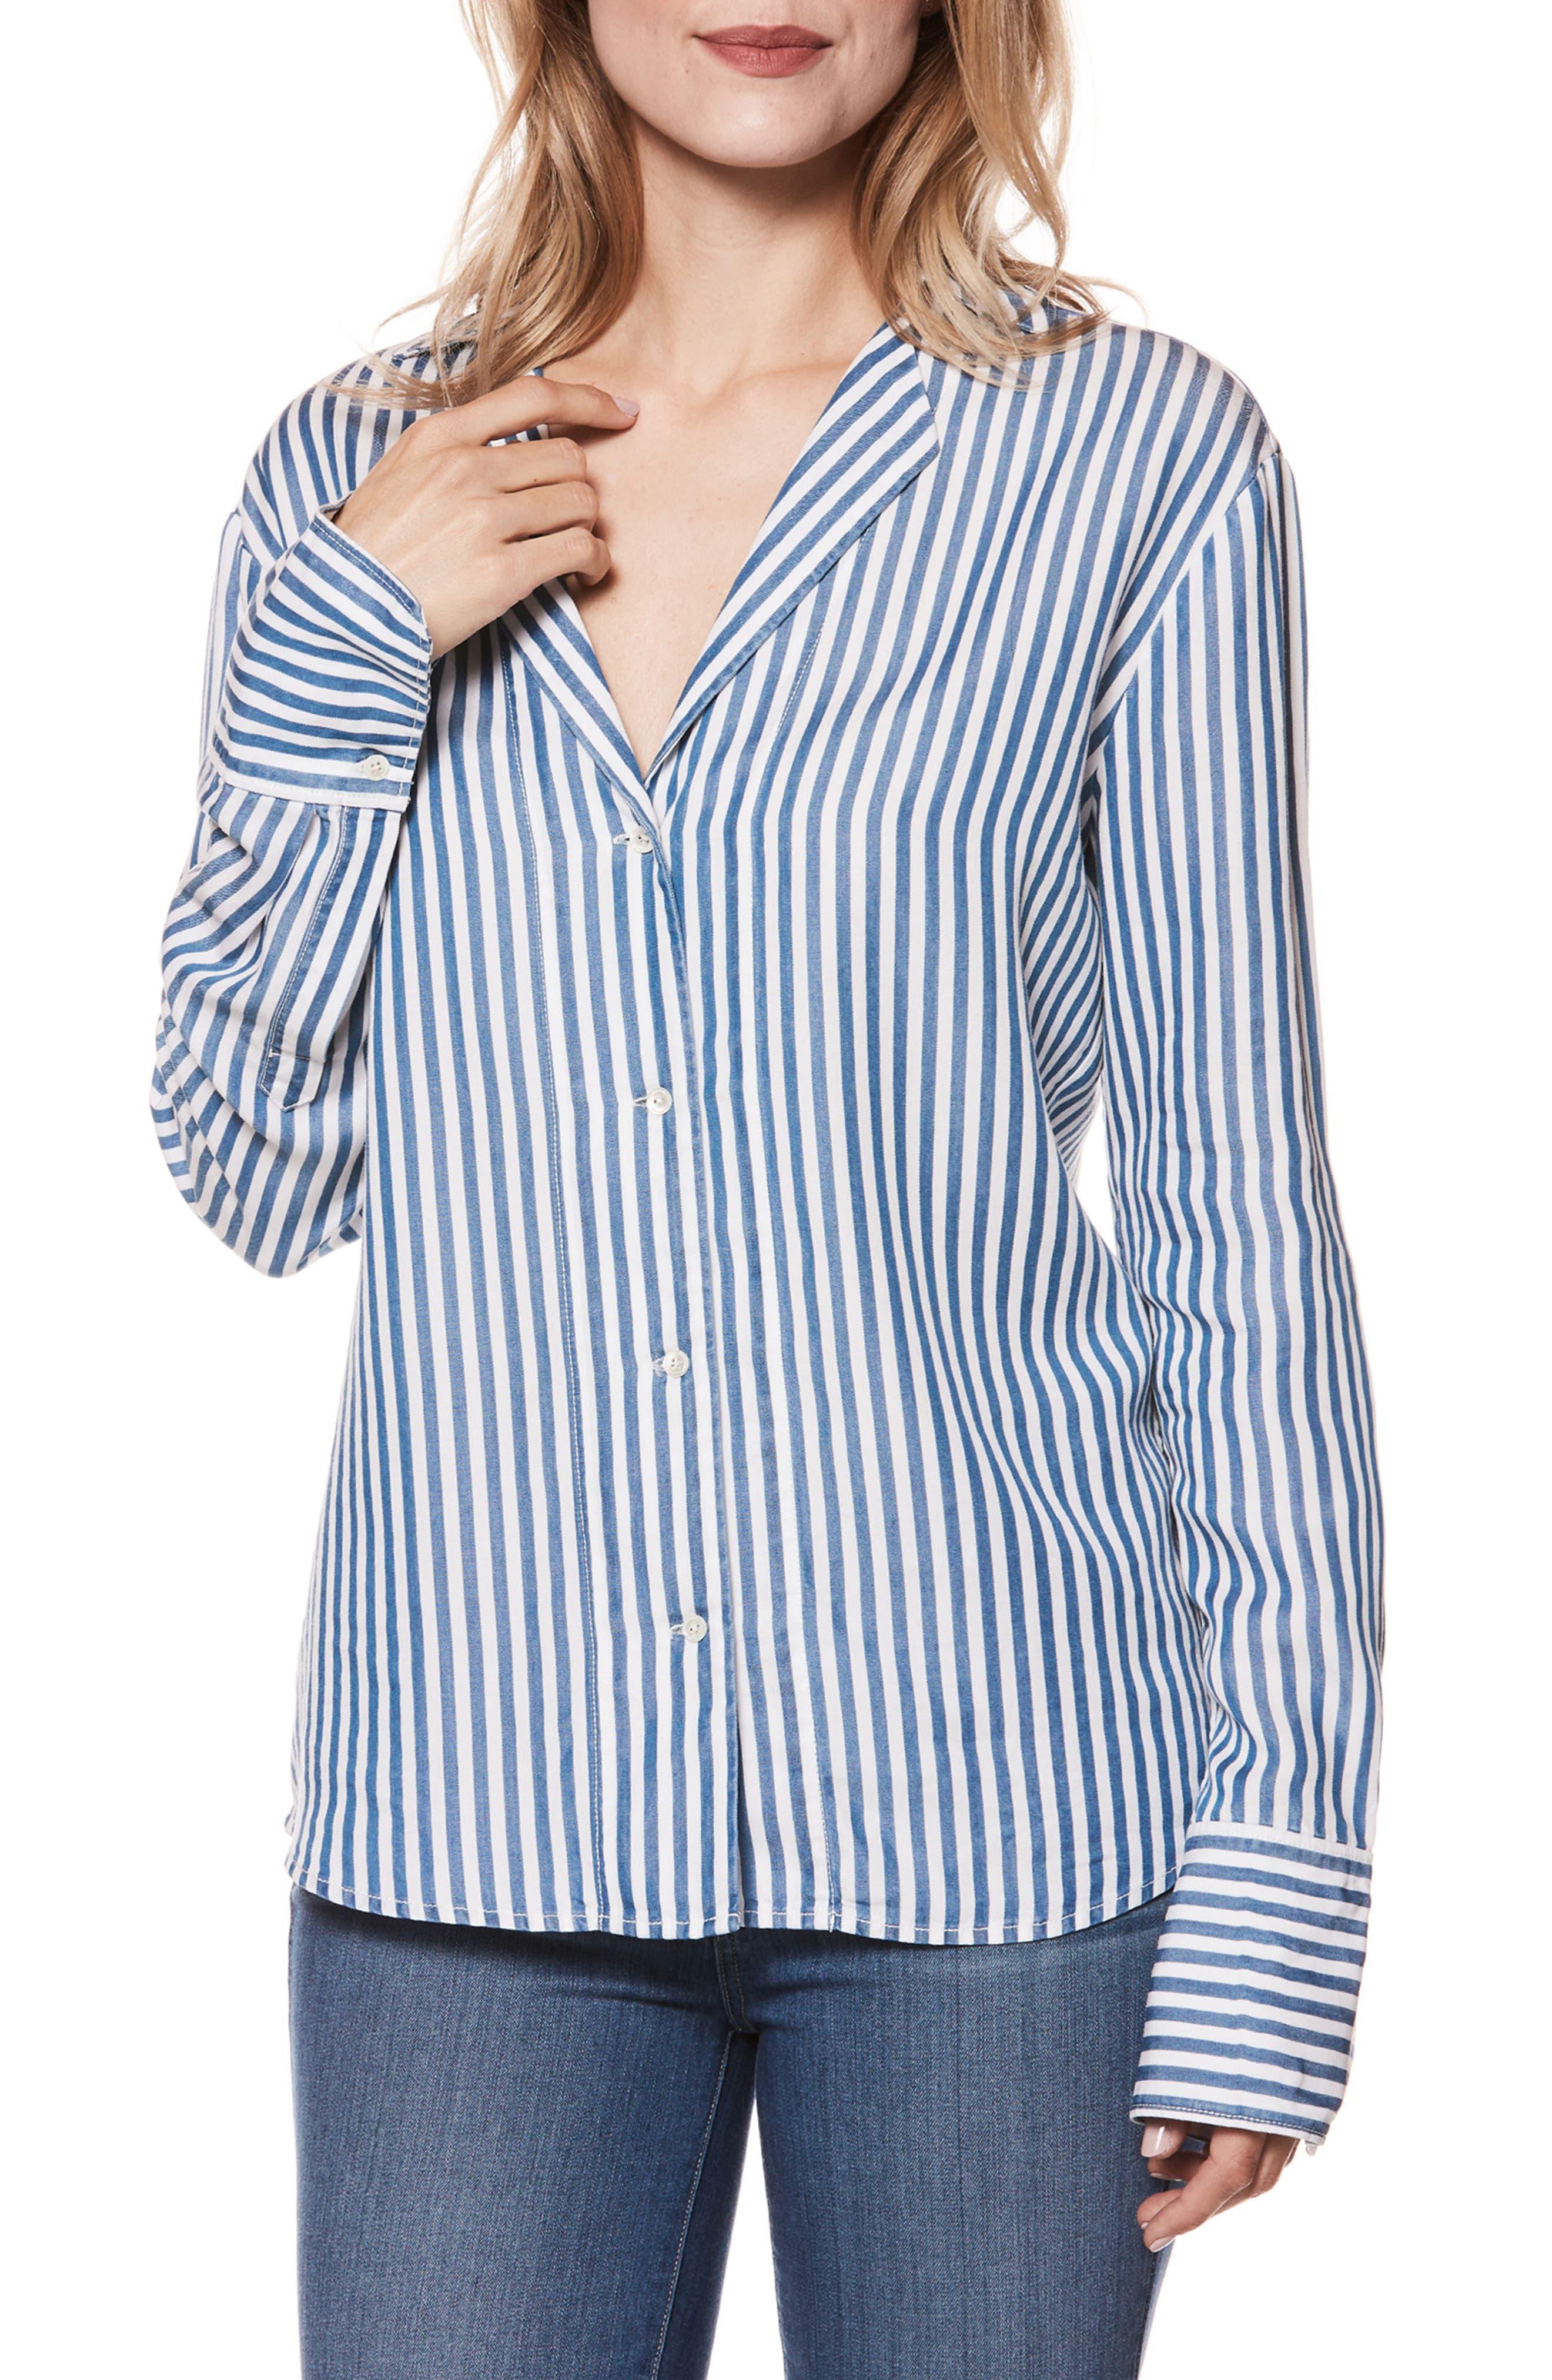 Elora Stripe Shirt,                         Main,                         color, White/ Blue Bell Stripe